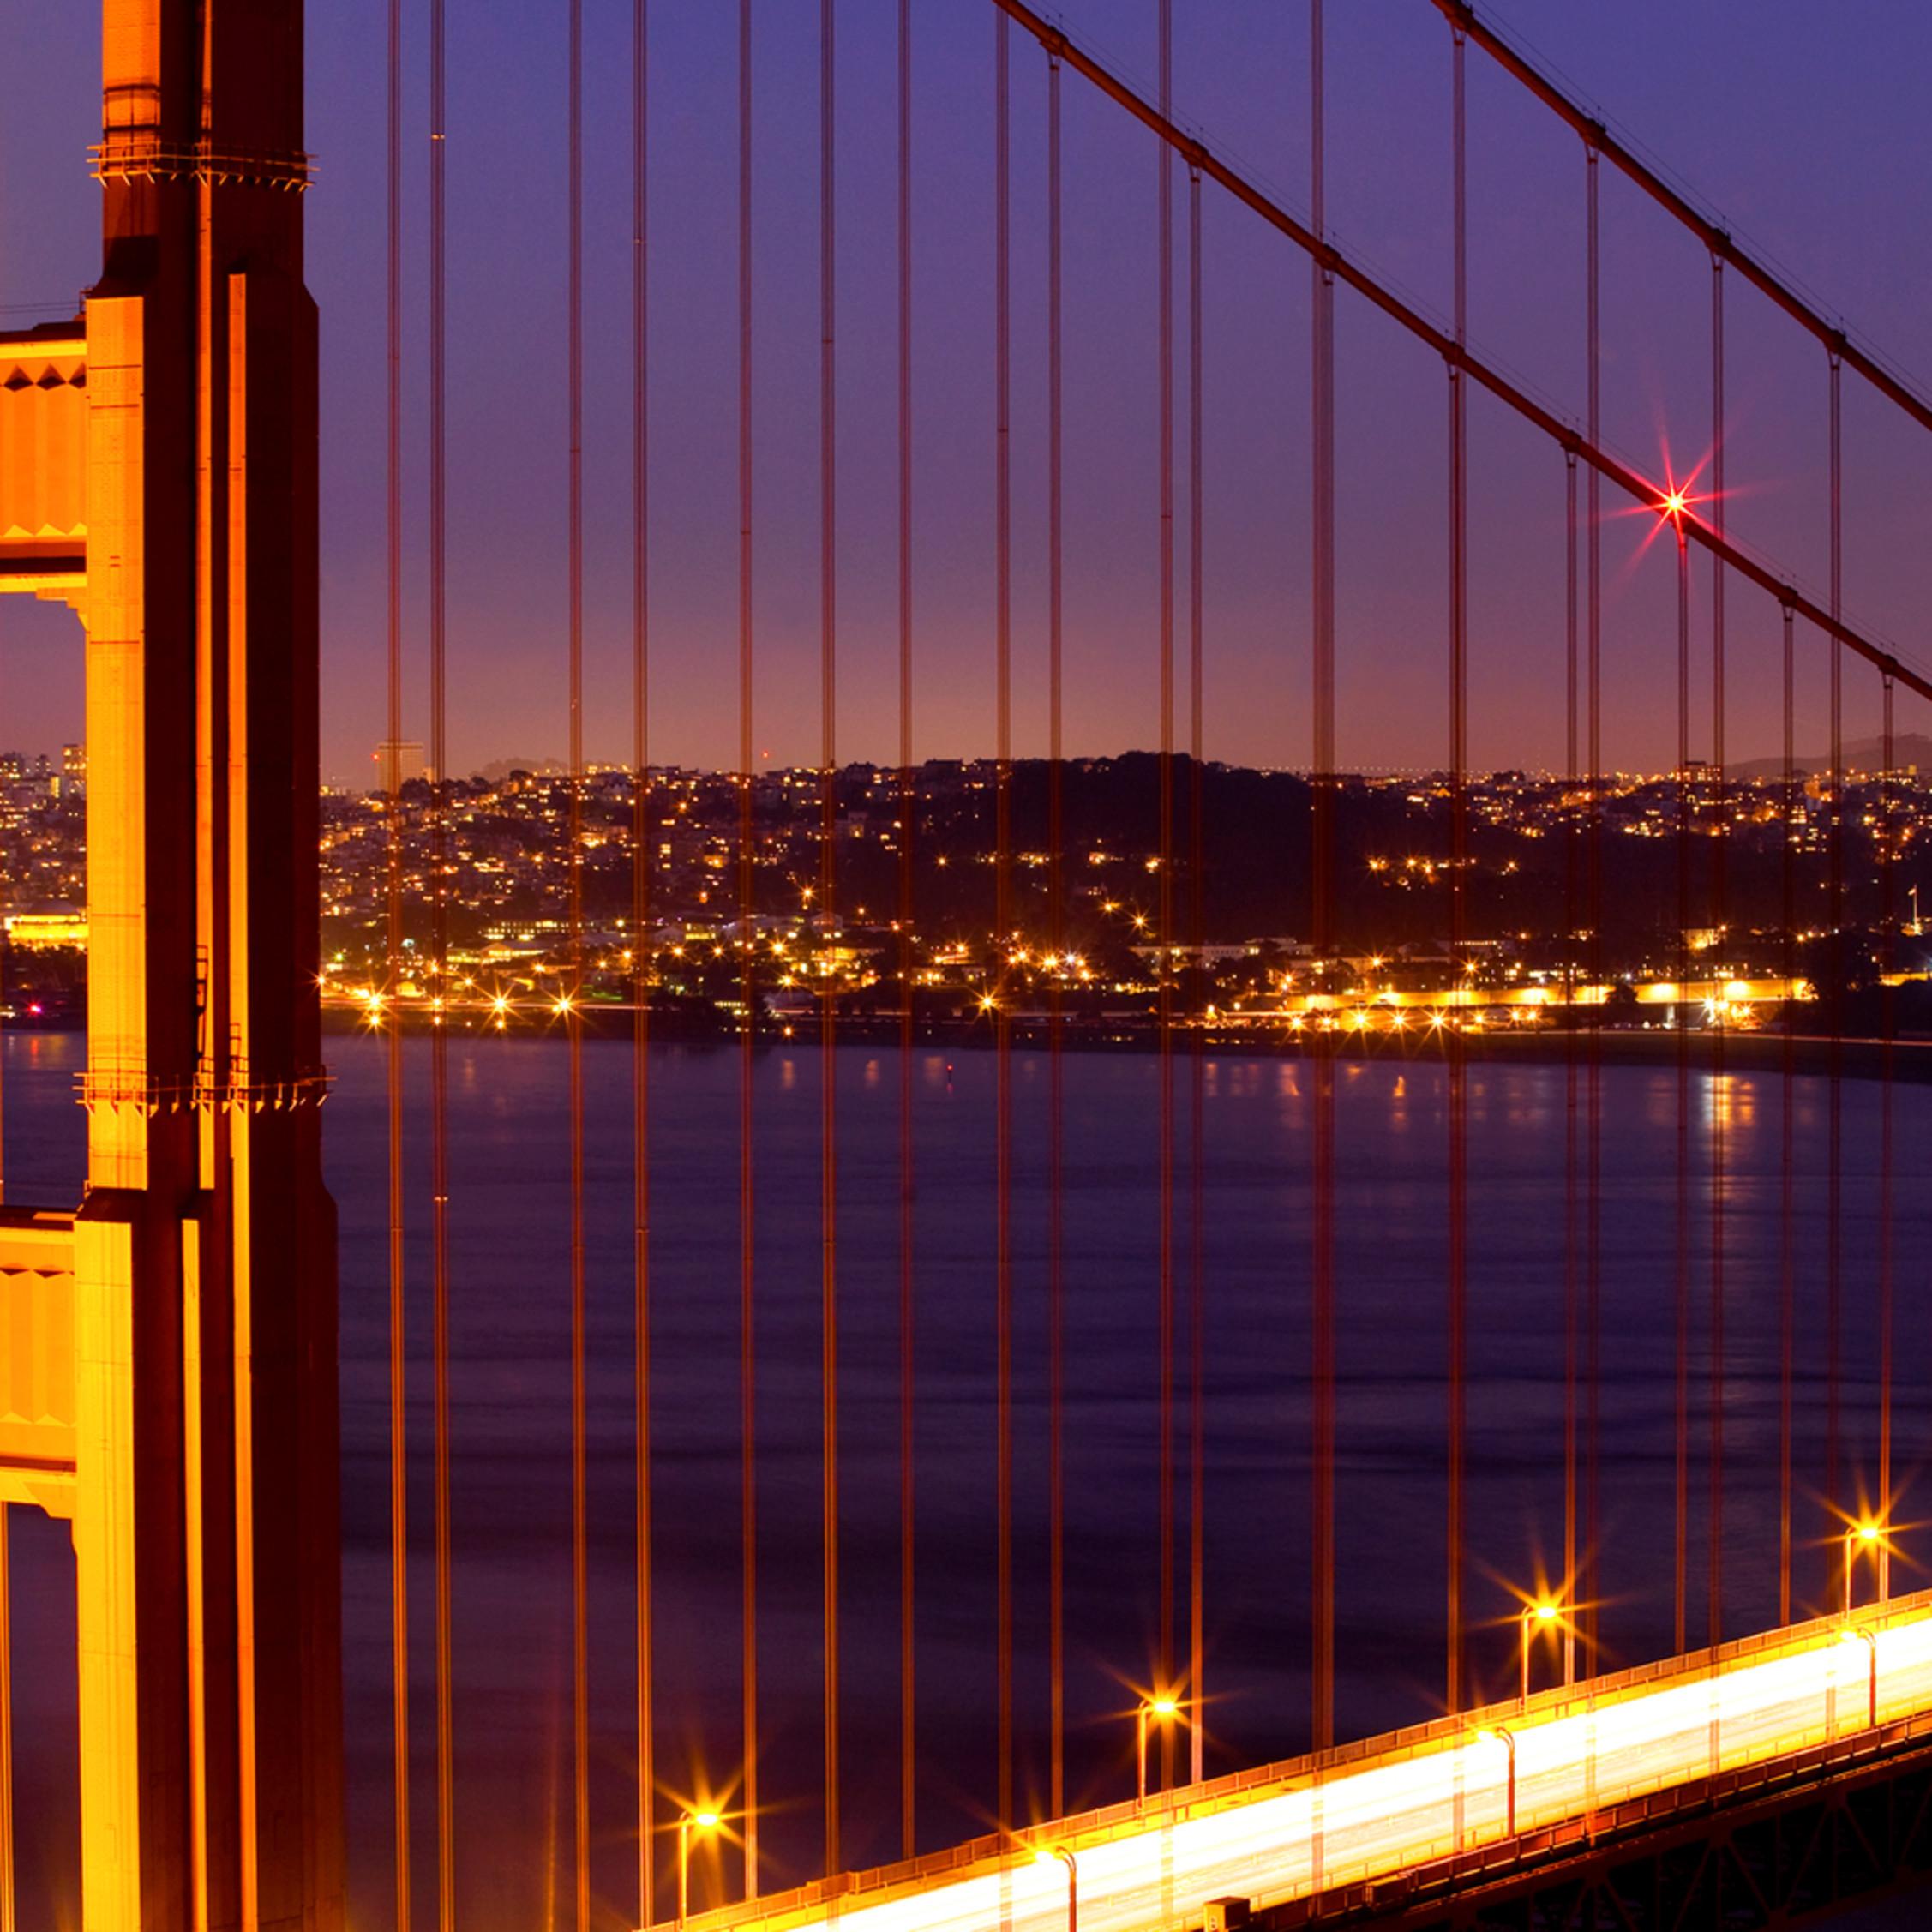 Gg bridge night dzamzq